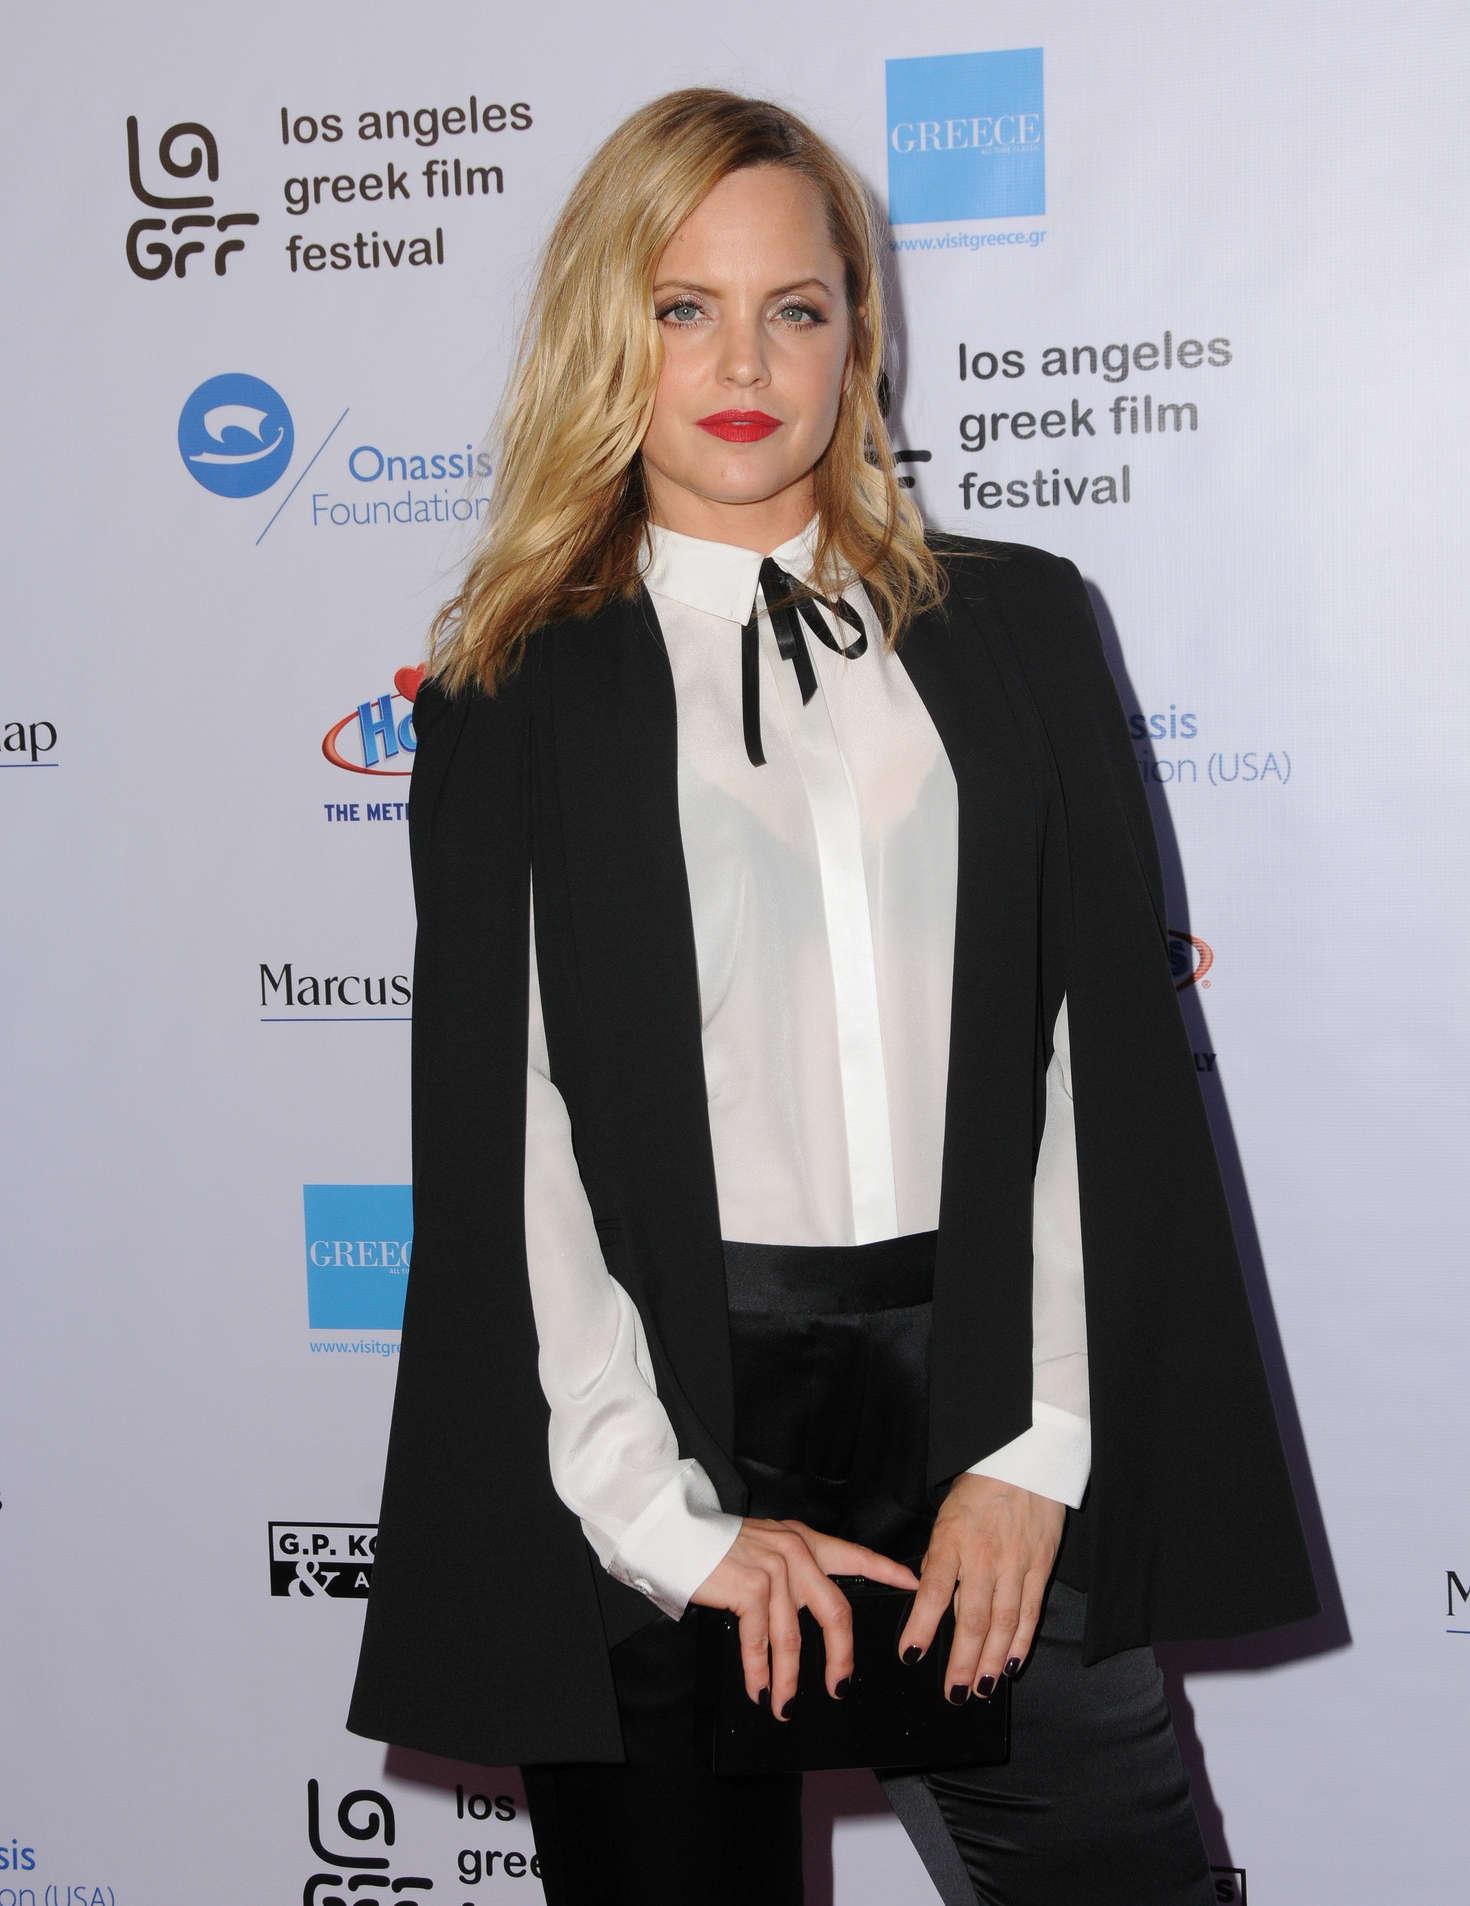 Mena Suvari - 'Worlds Apart' Premiere at 2016 LA Greek Film Festival in Hollywood